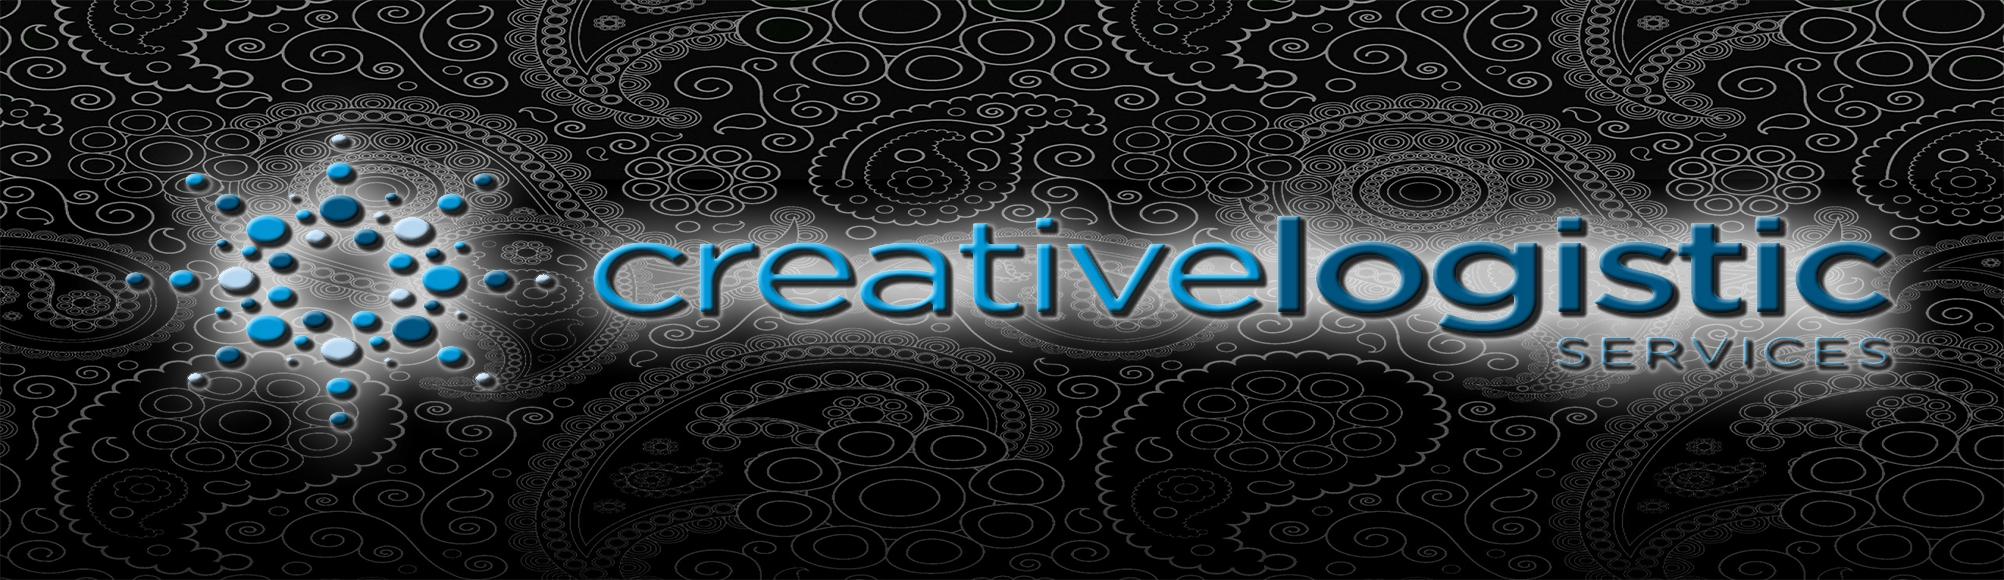 -Creative Logistic (Original) (FIX-FINAL) - (PNG) - with black Drop Shadow + Bevel - Copy (BLACK & WHITE) COOL.jpg